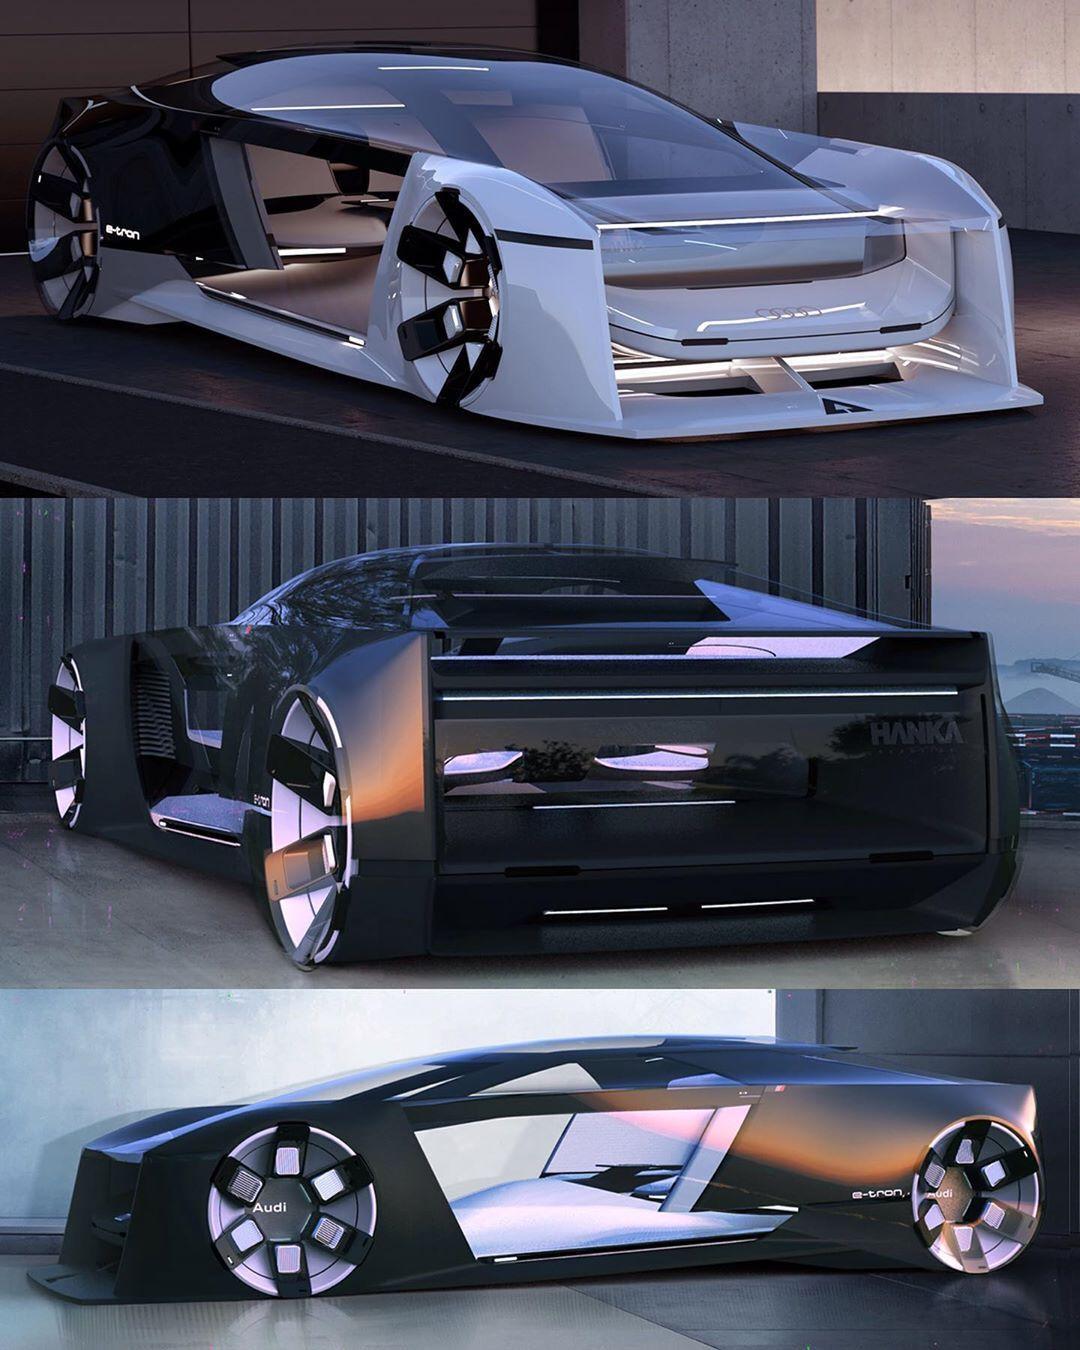 Cardesignworld Car Design Drive Luxury Car Luxury Car Tuning Cars For Future Concept Car Design In 2020 Future Concept Cars Futuristic Cars Concept Car Design